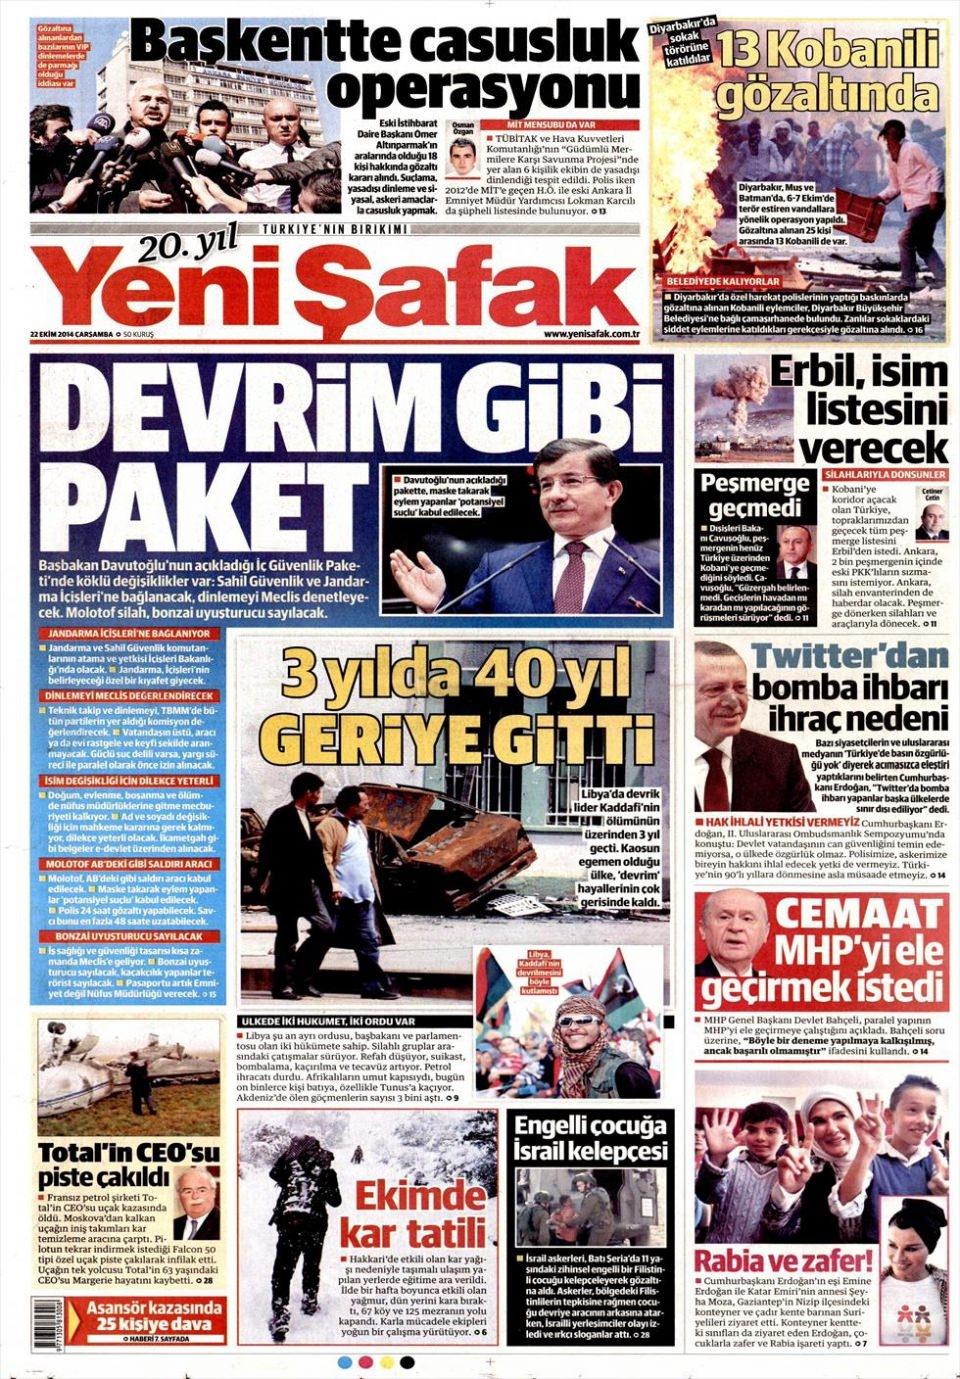 22 Ekim 2014 gazete manşetleri 24